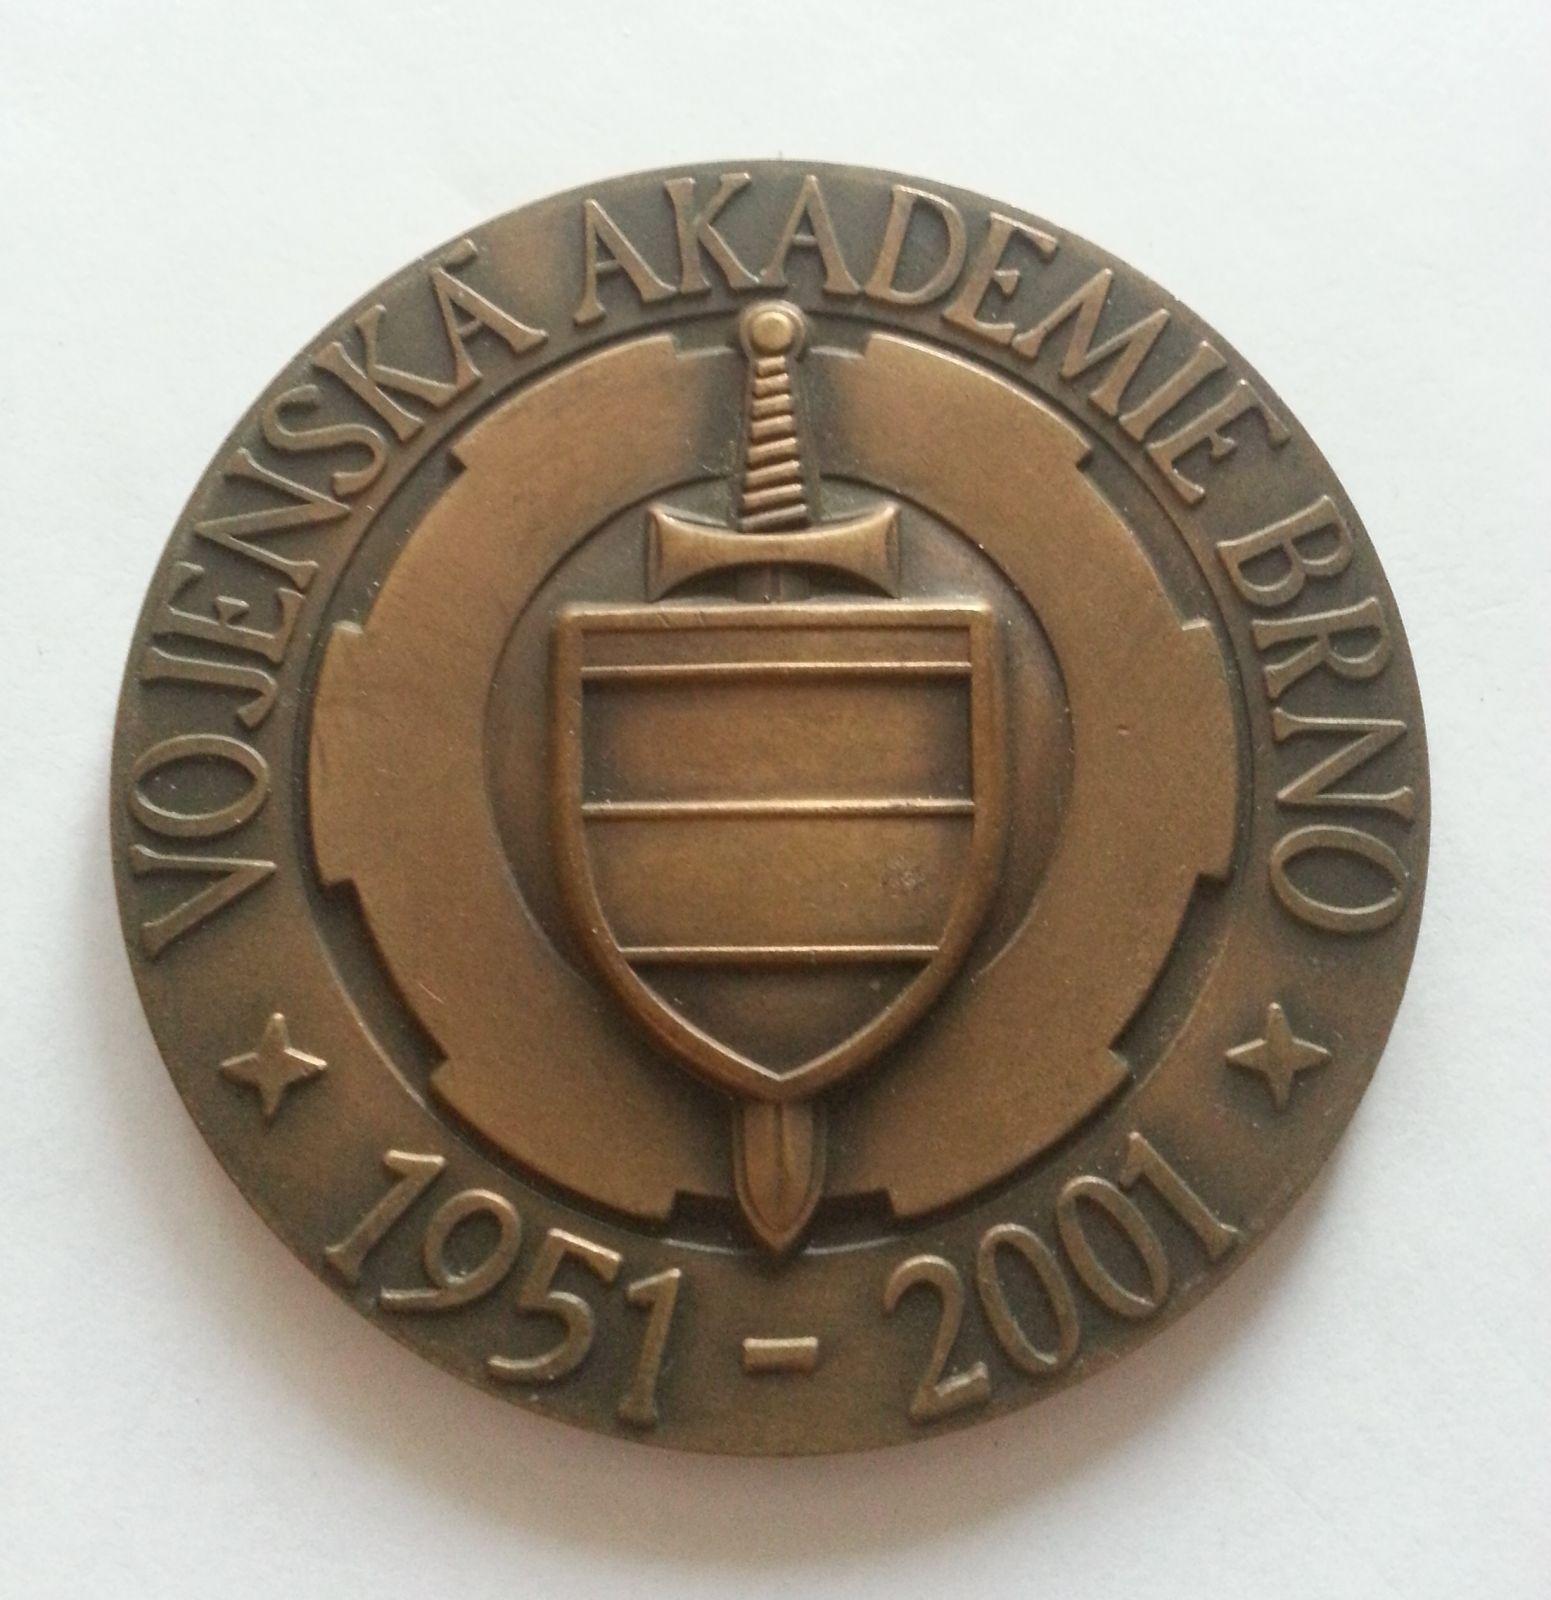 vojenská akademie Brno, (průměr 70 mm), 1951-2001, ČSSR